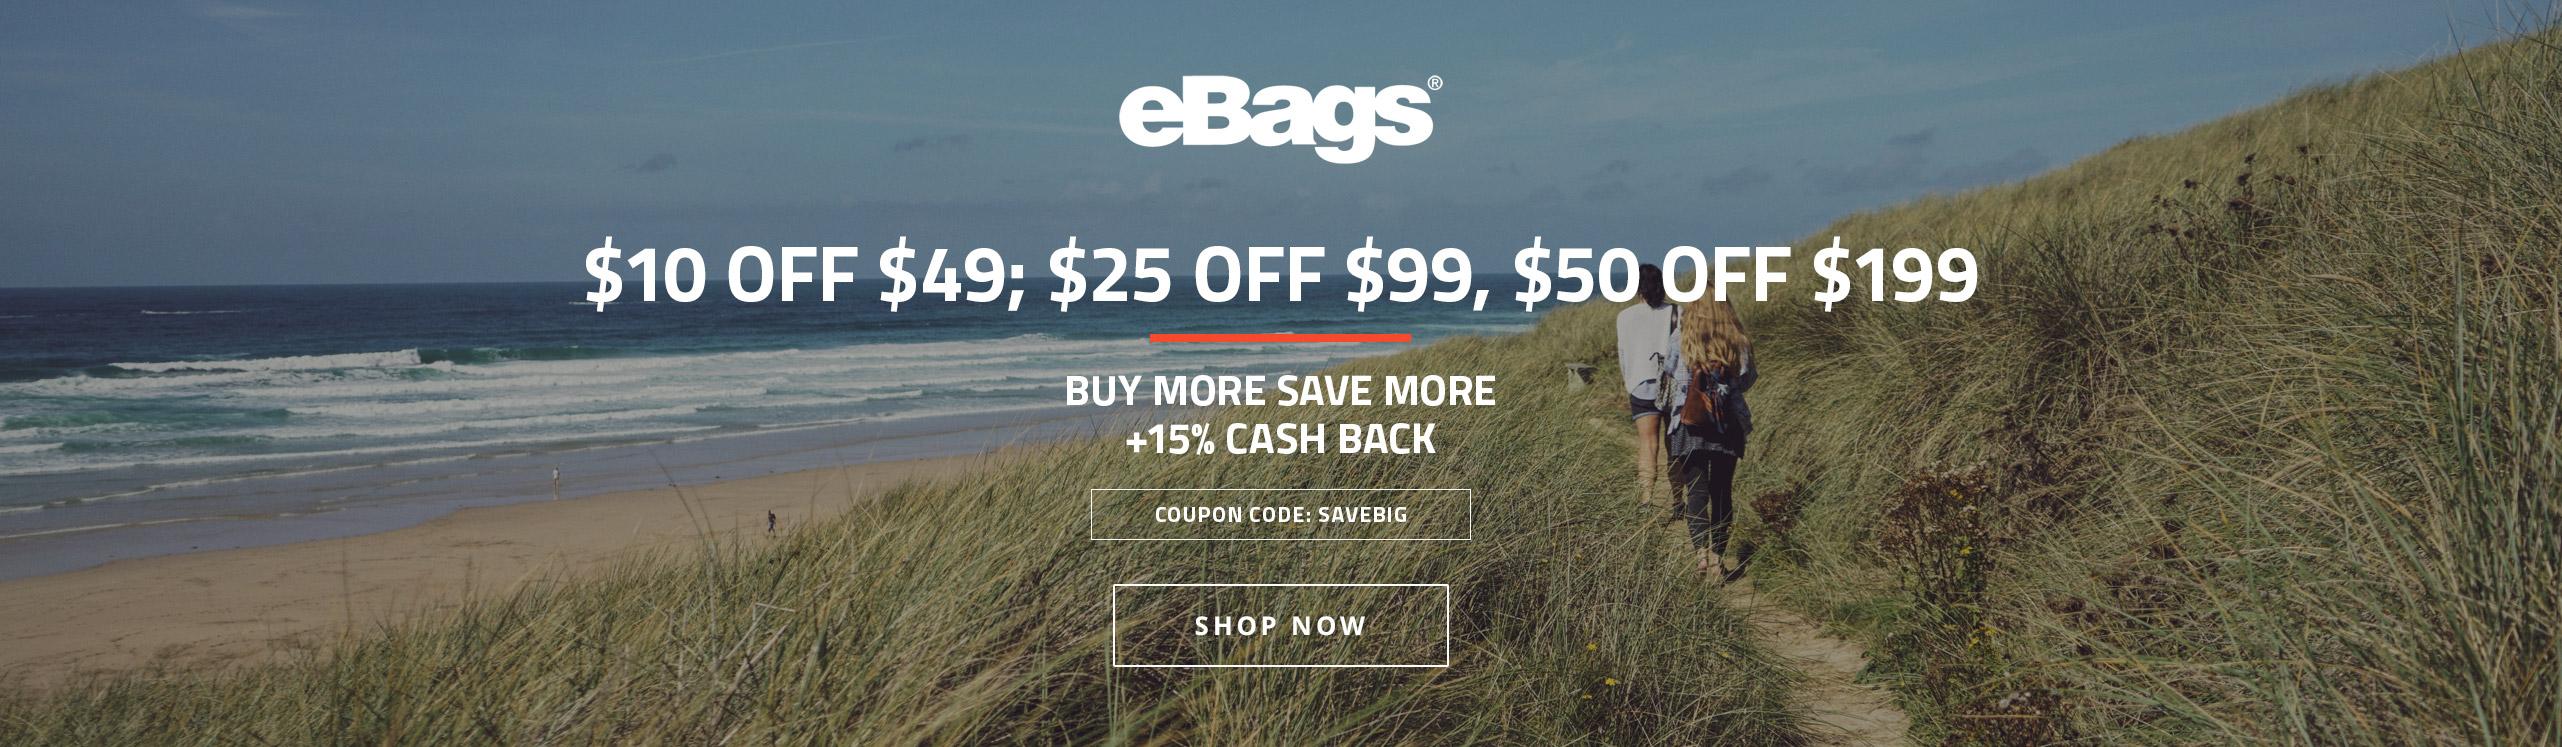 eBags (15%) Buy More Save More